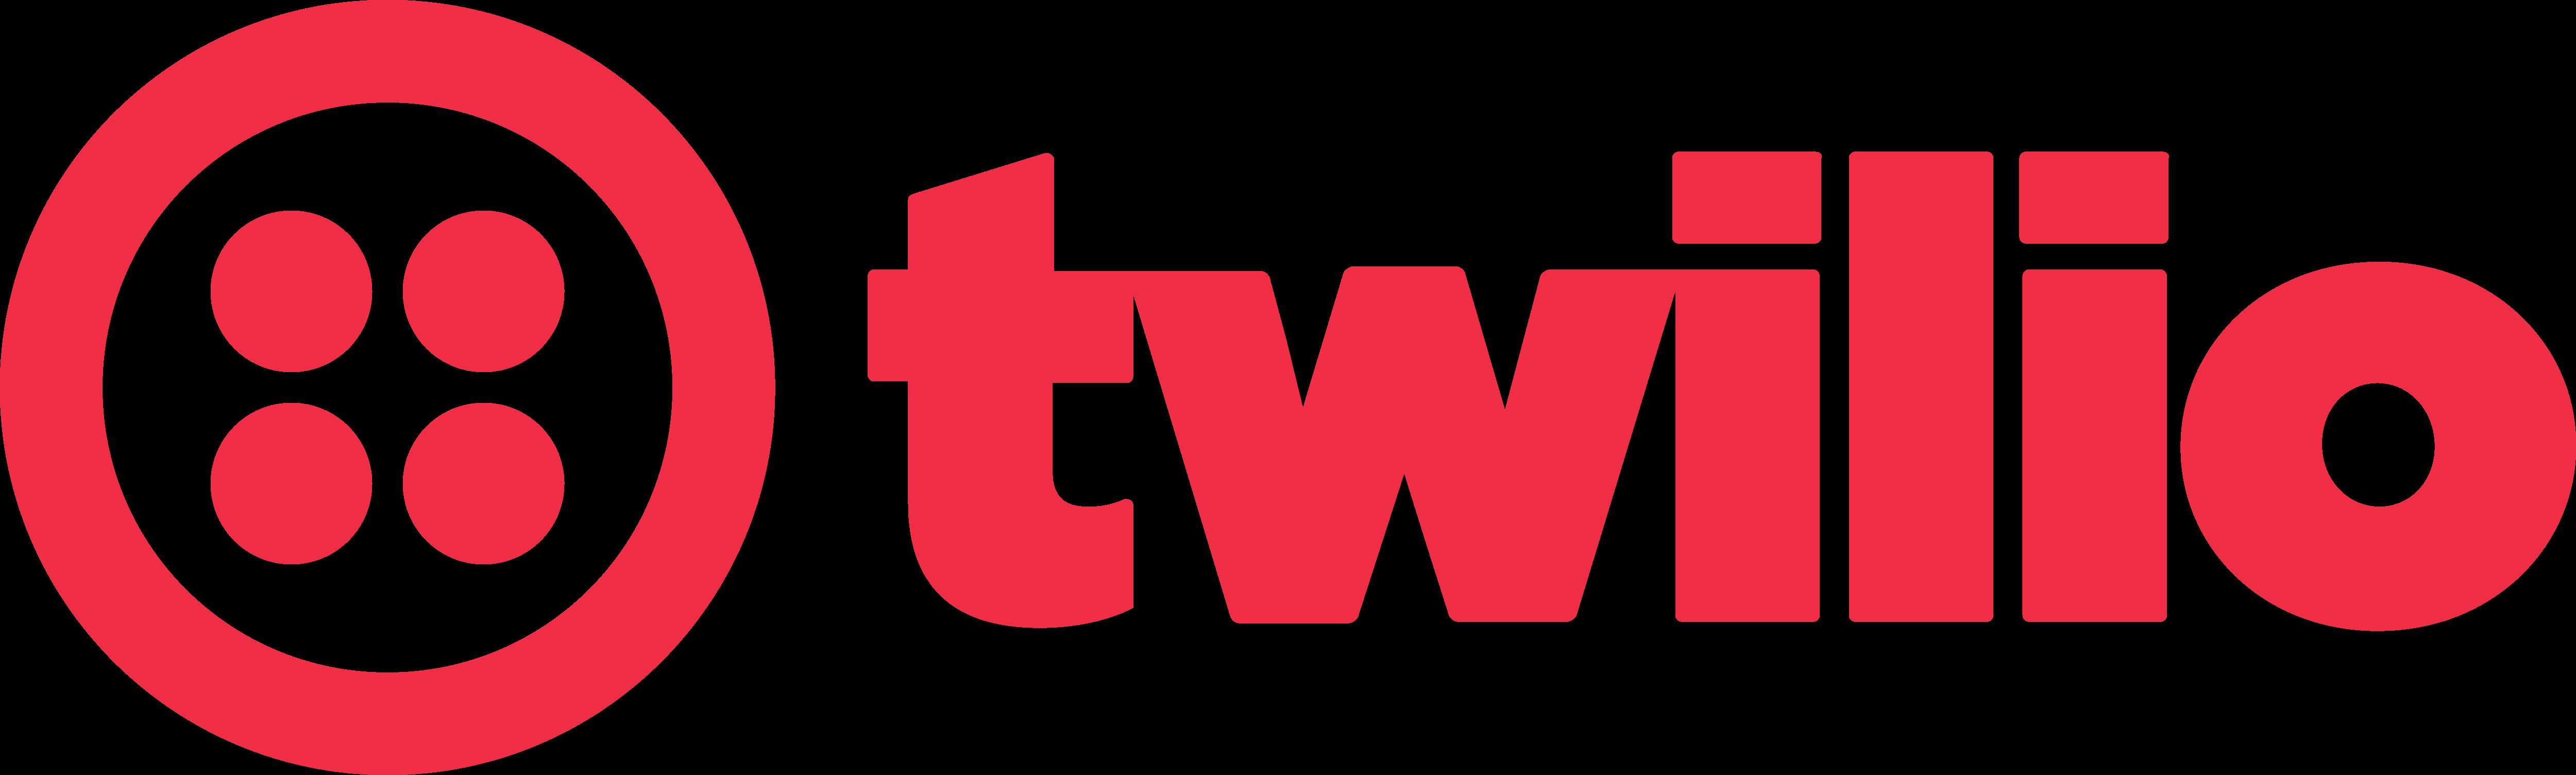 Twilio U.S. SMS Short Code Heightened Awareness Period for Black Friday & Cyber Monday - Twilio